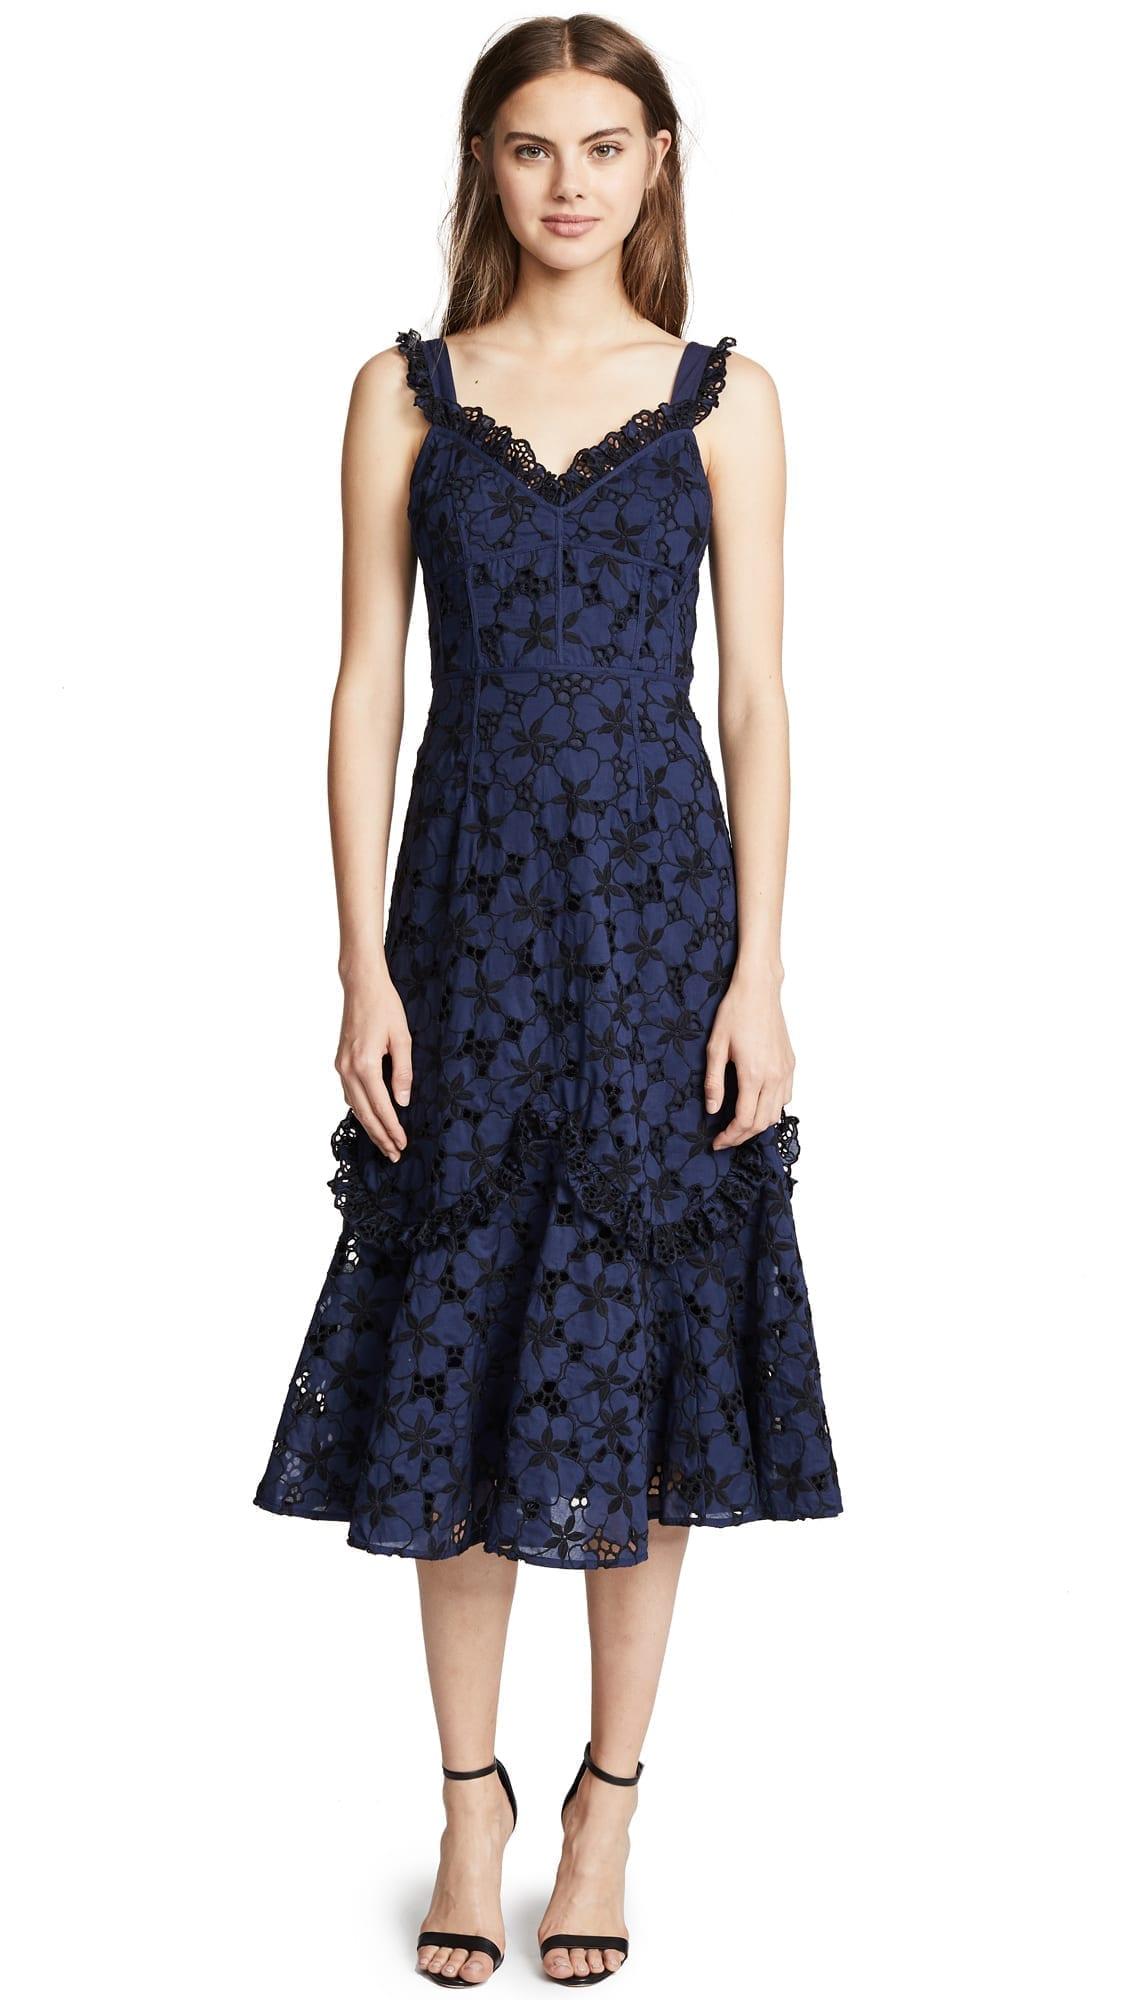 REBECCA TAYLOR Adriana Blueberry Dress